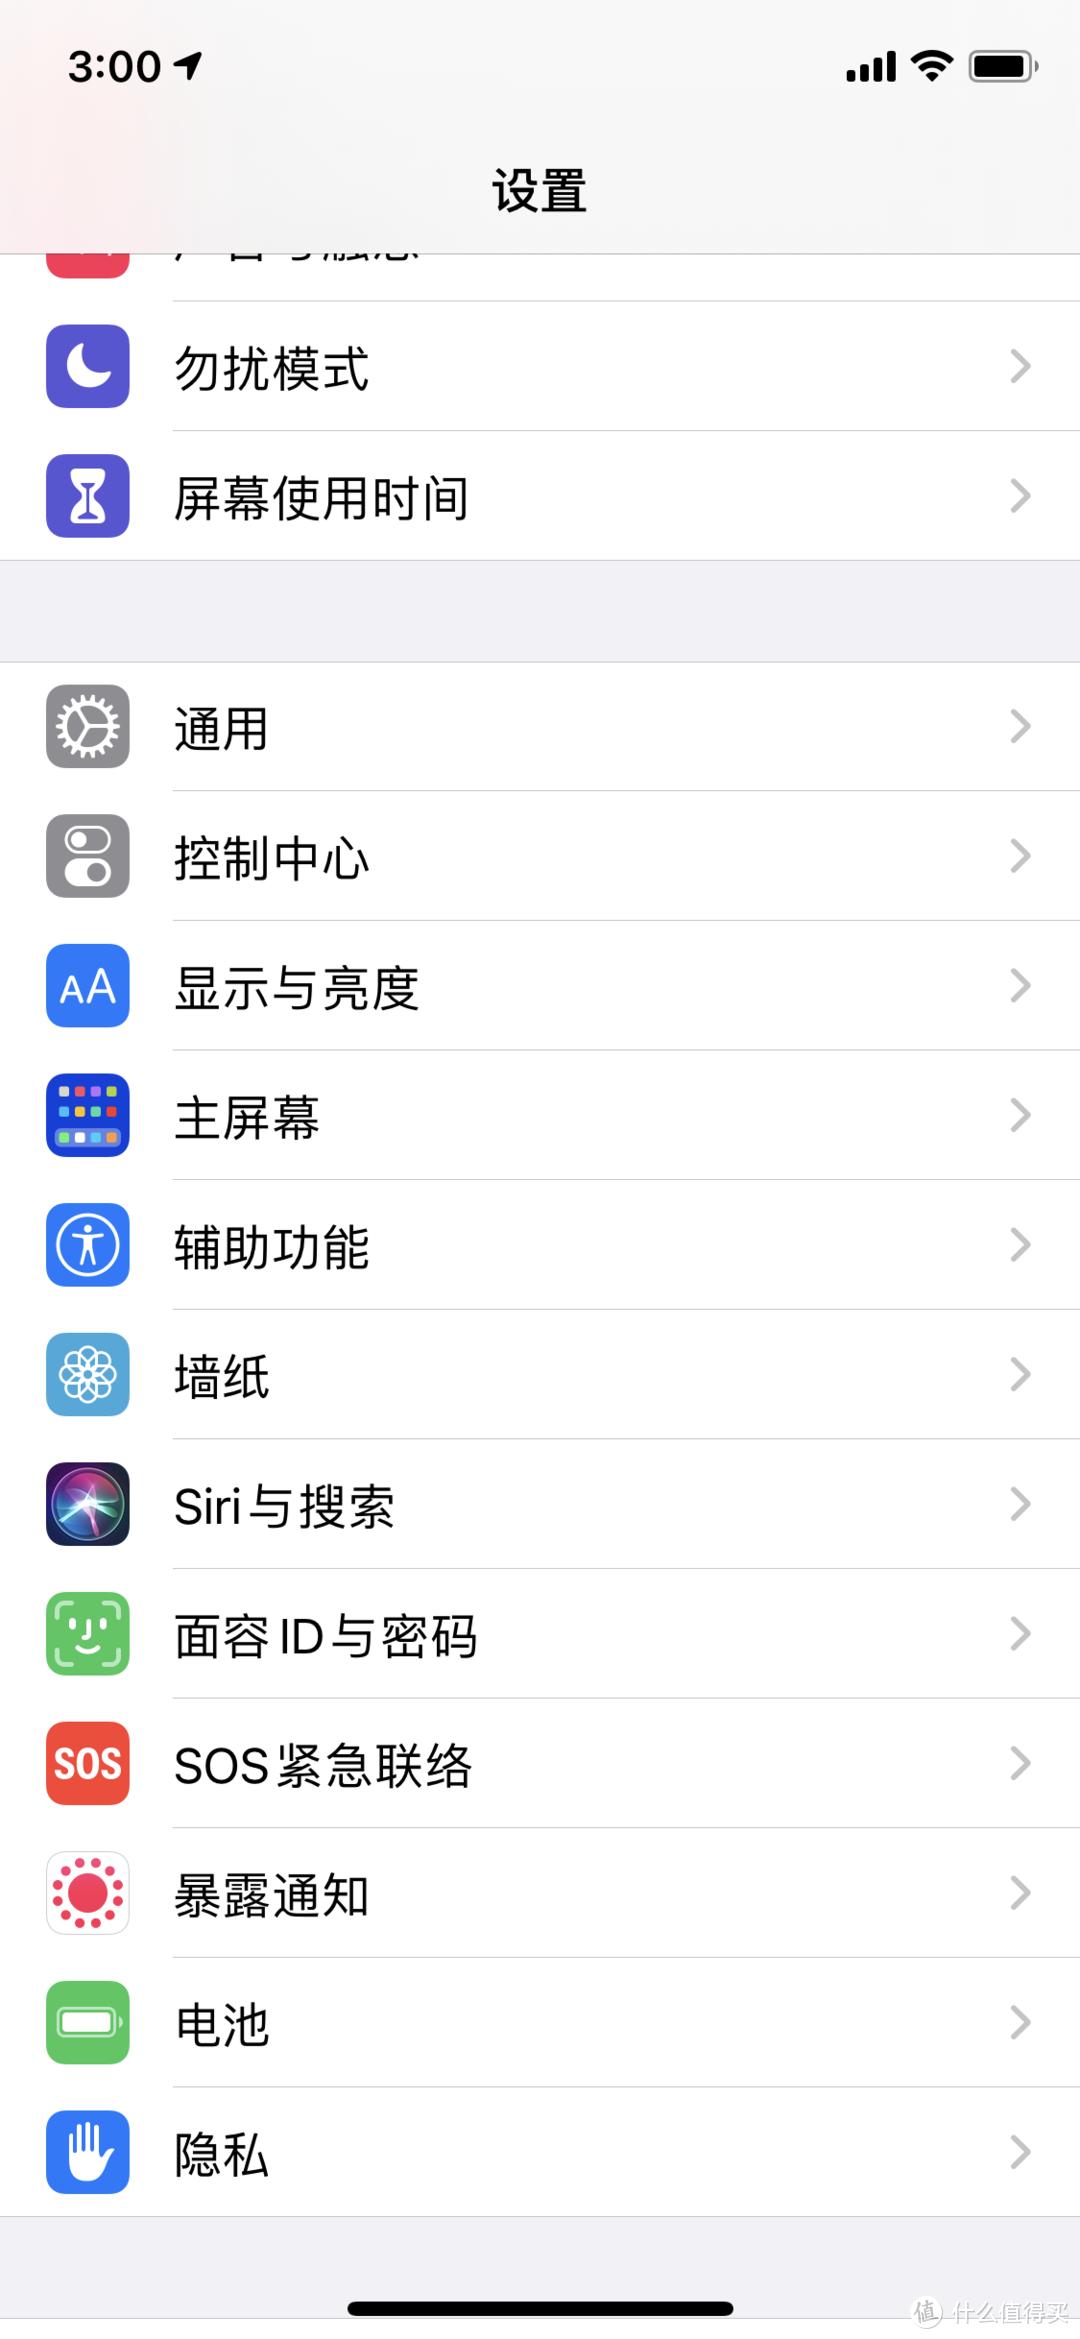 iPhone真的可以保护个人隐私吗!